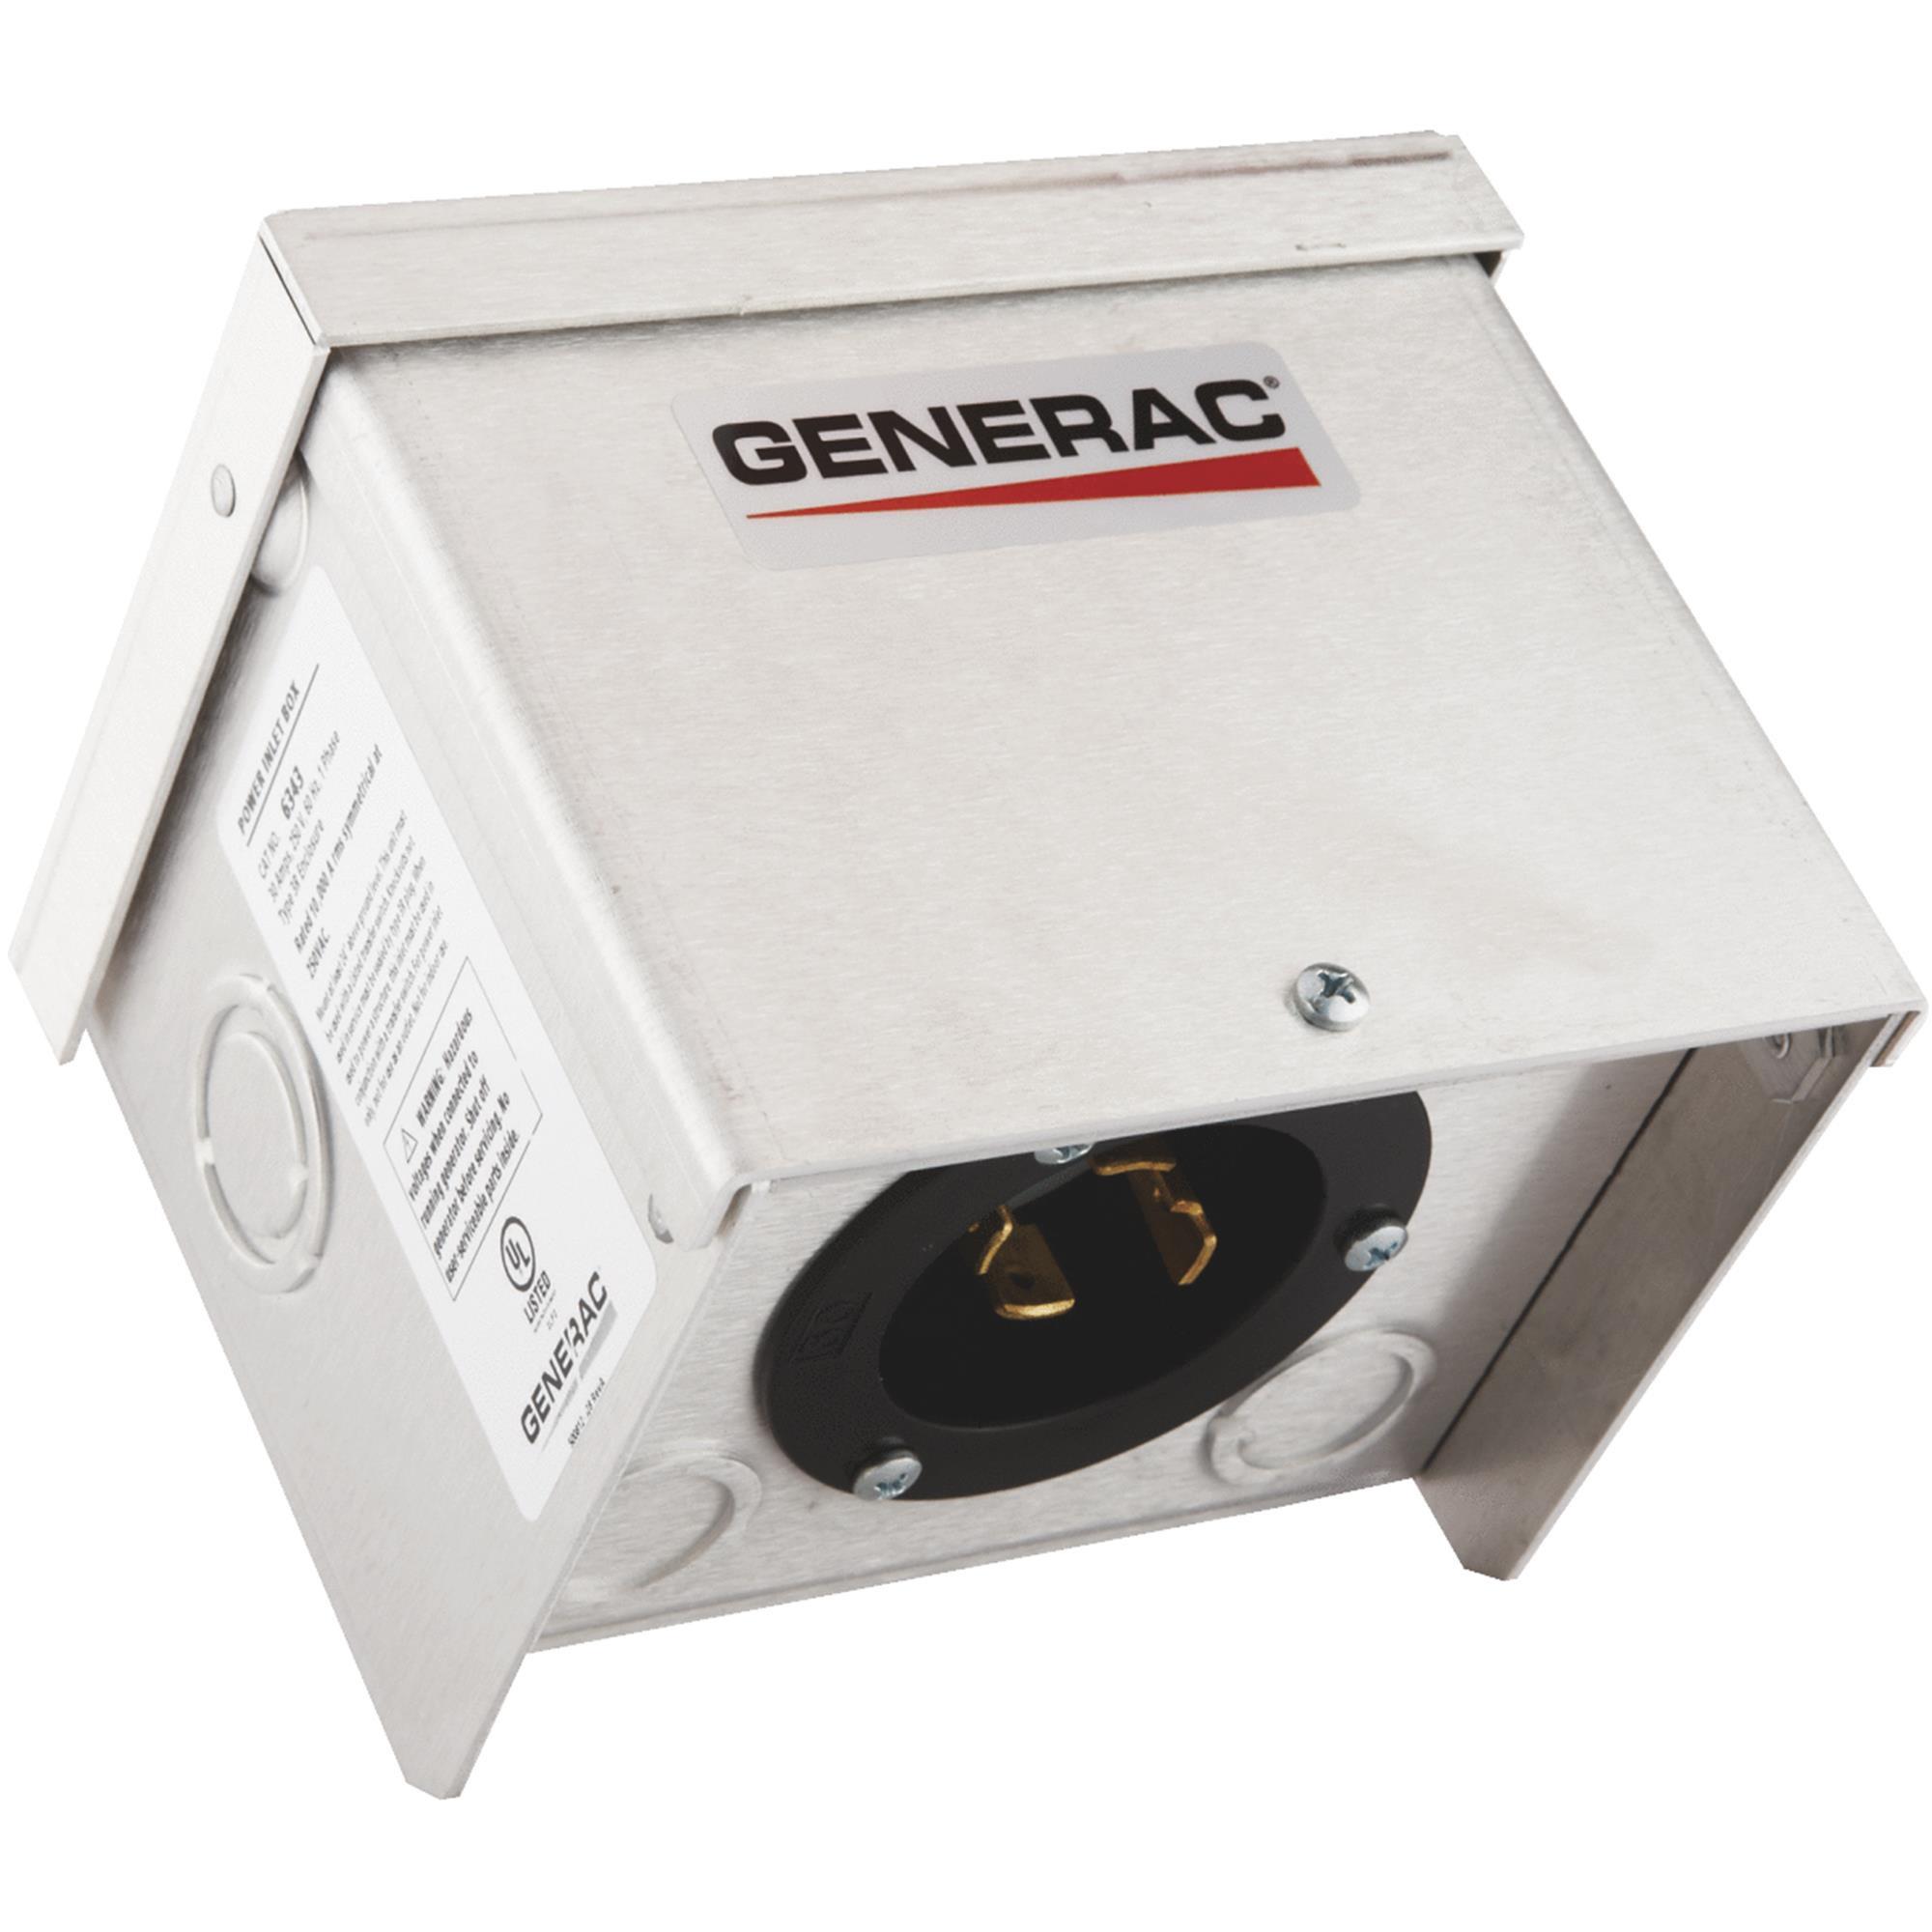 Power Inlet Box,30 Amp AC GENERAC 6343